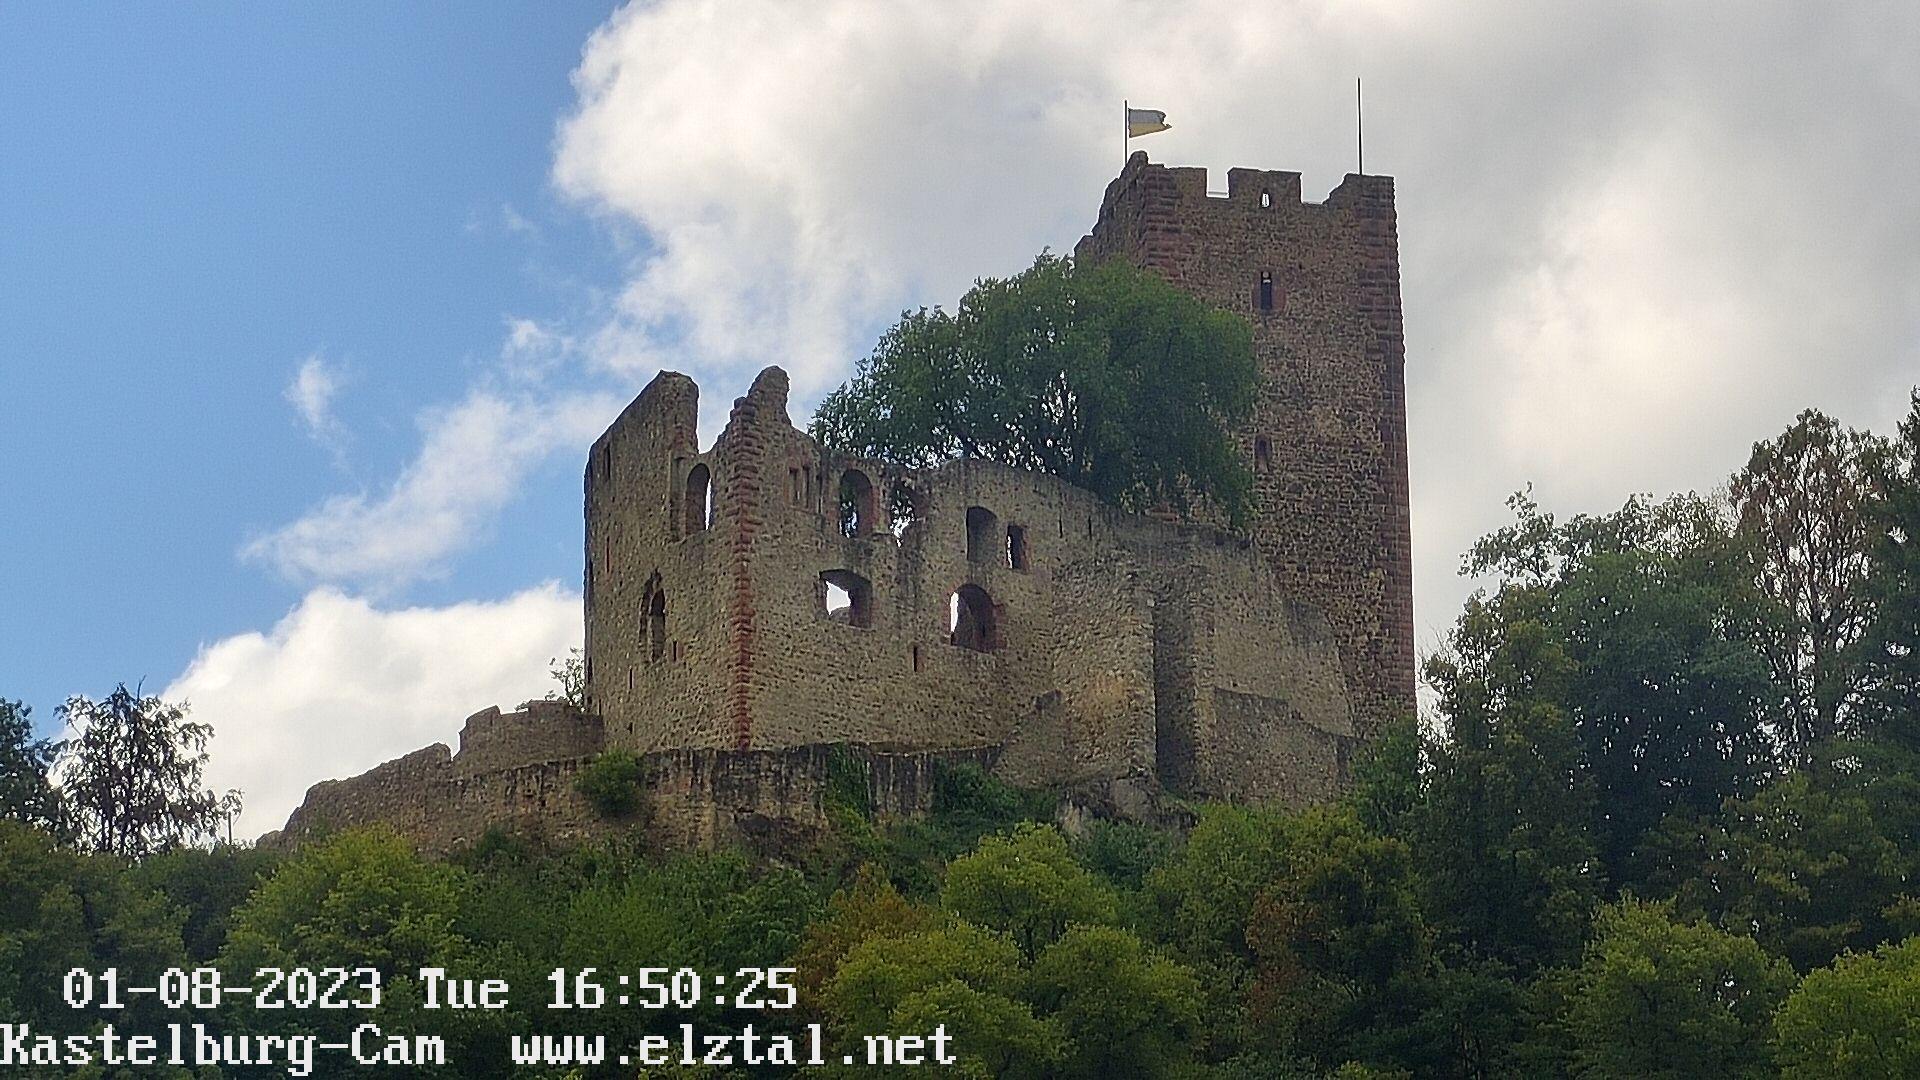 Waldkirch Wed. 16:55